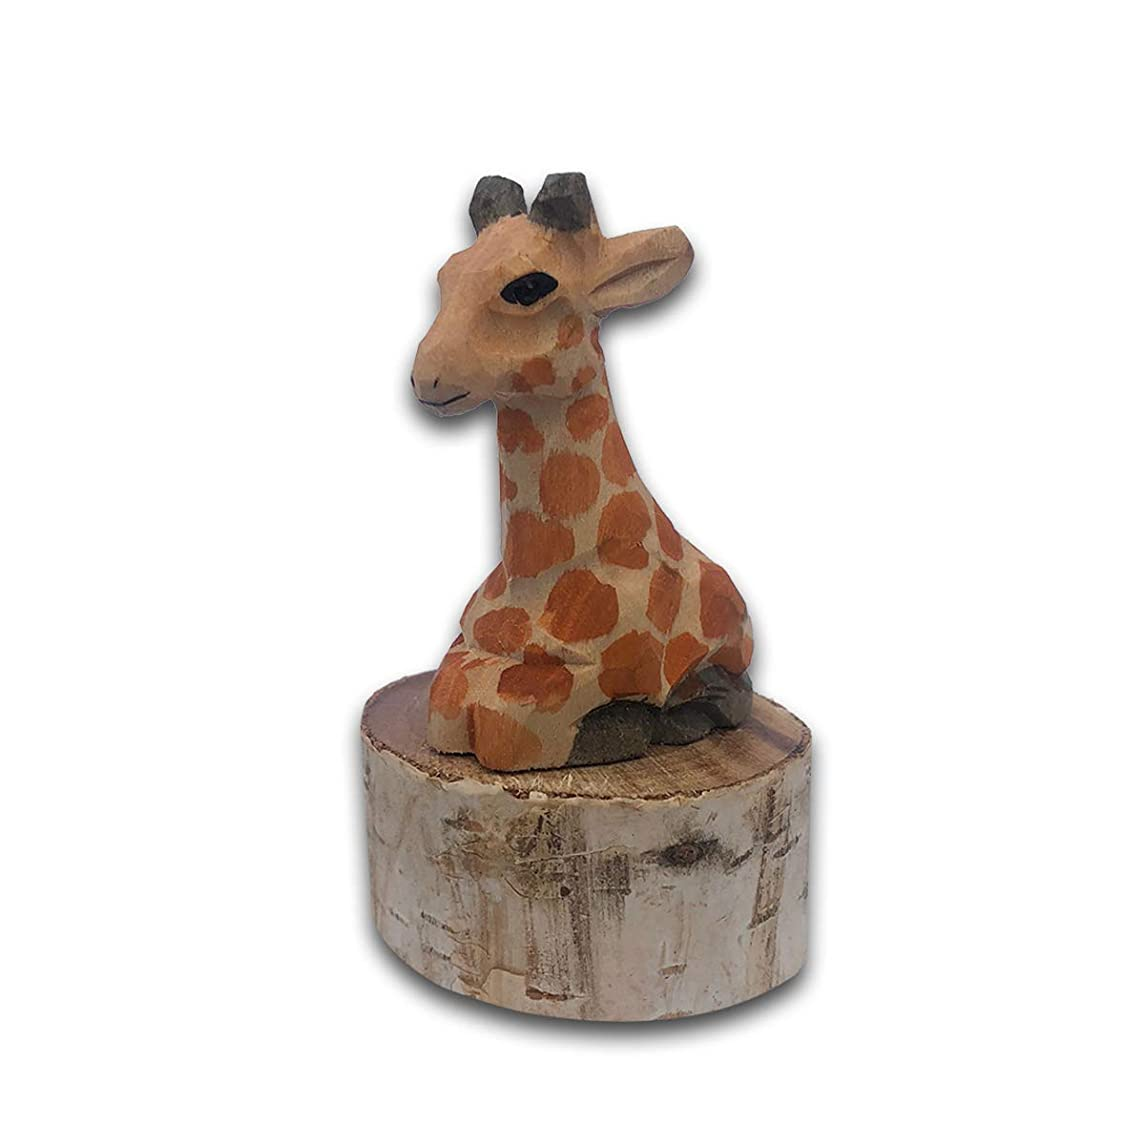 BYLA Manual Mechanical Sharpeners, for Kids & Colored Pencils, 1-Pack, Wooden animal shape pencil sharpener, handmade - Giraffe